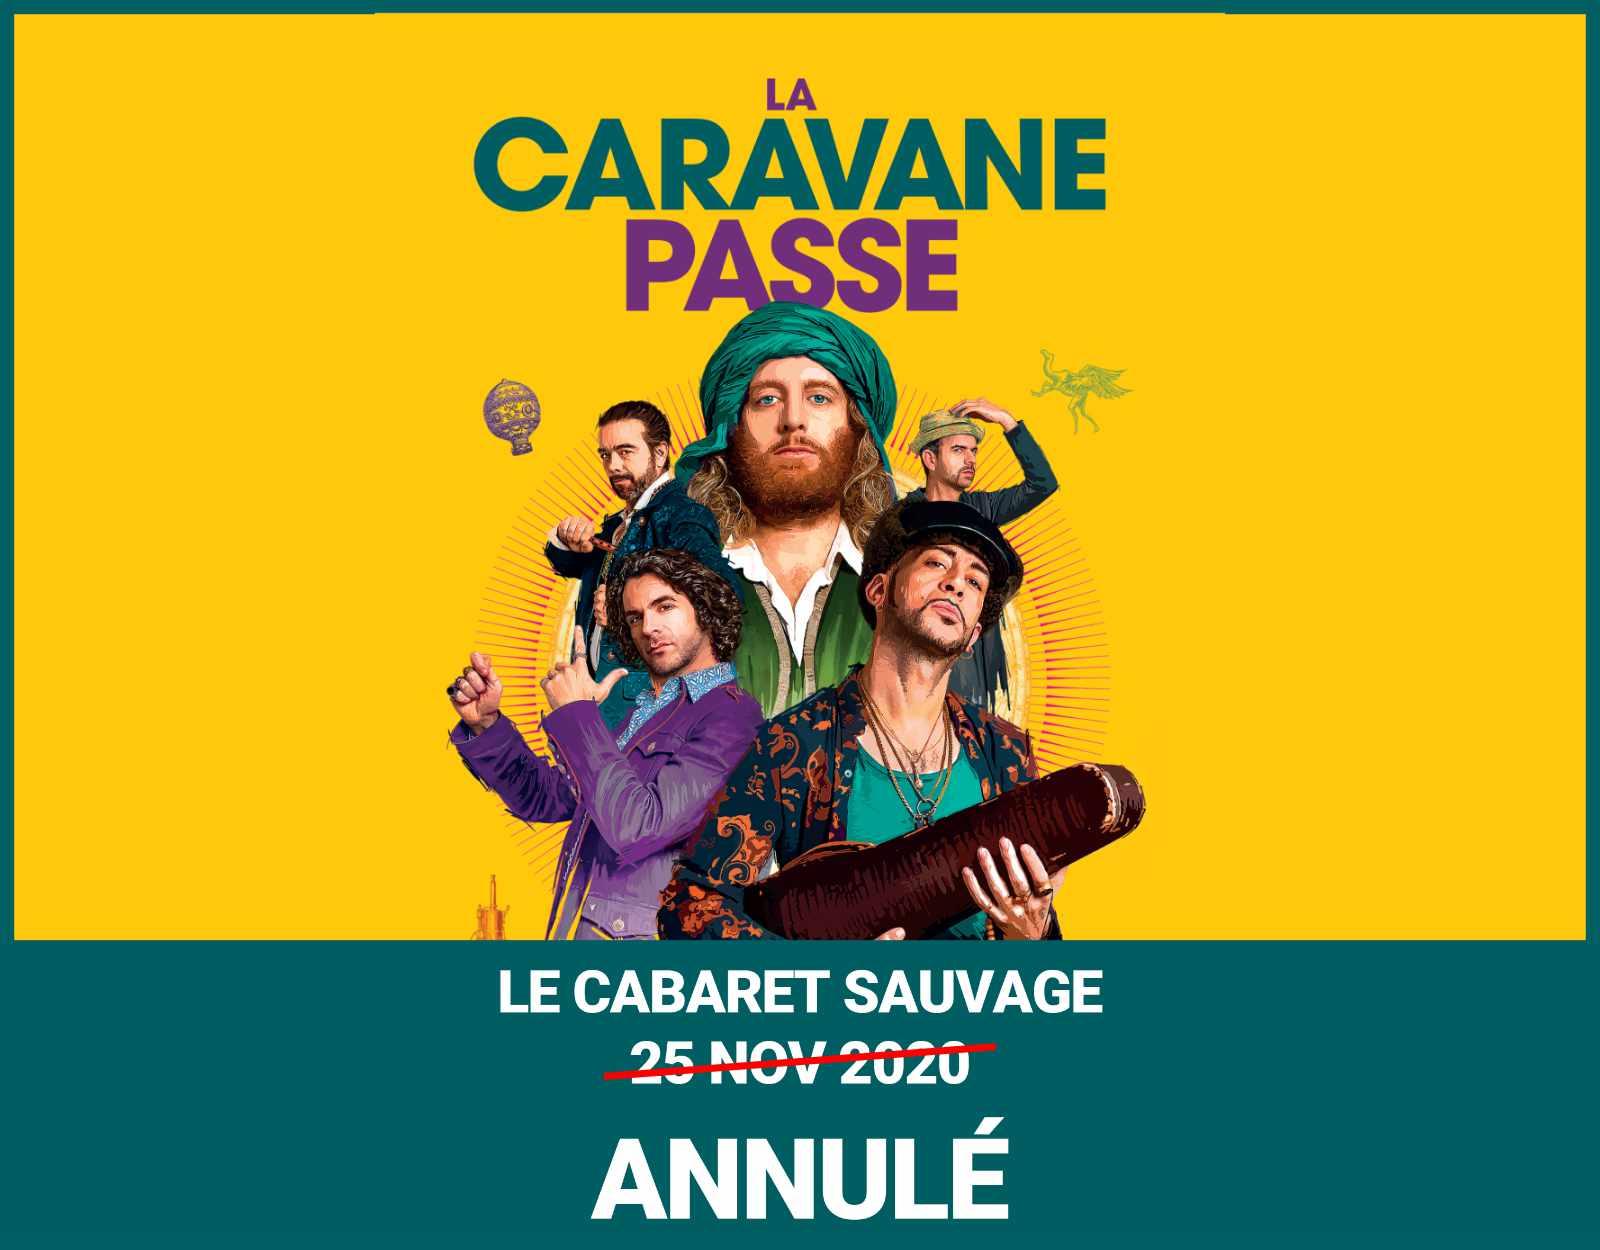 La caravane passe au cabaret sauvage concert annule